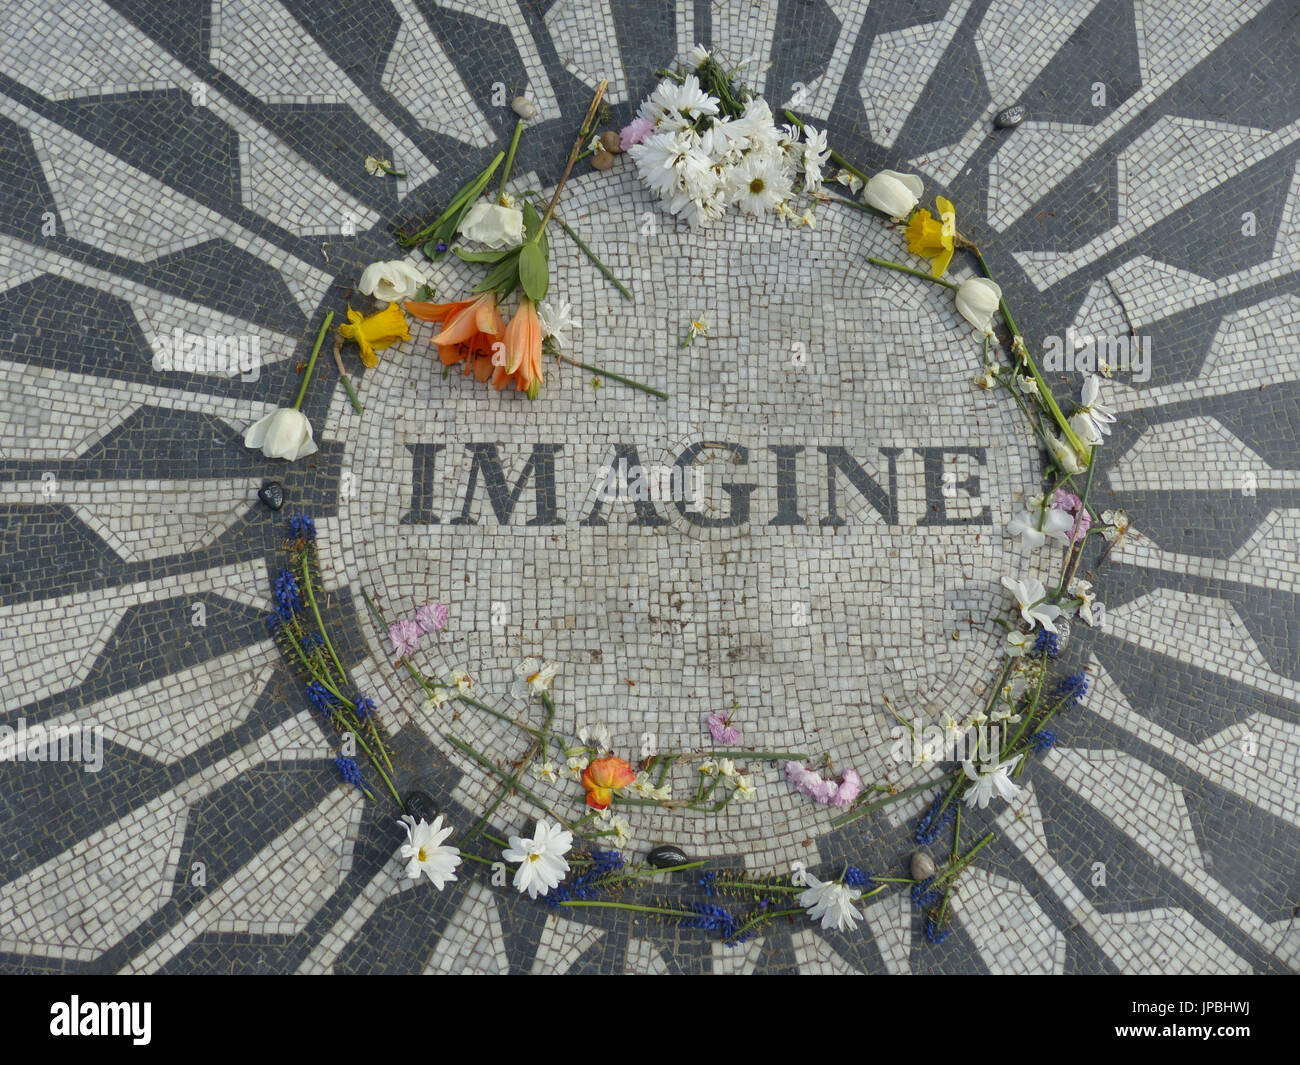 John Lennon Memorial at Strawberry Fields, Central Pak, NY - Stock Image